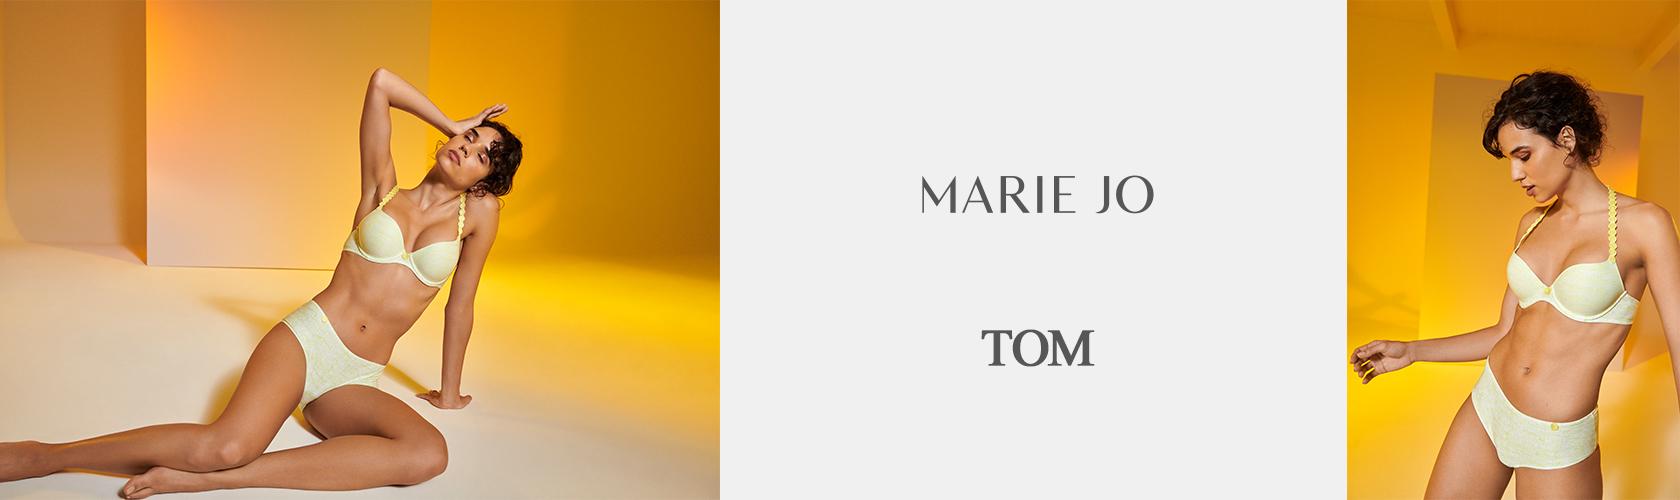 2020000936 Slideshow Tom LMC 18.03.2021